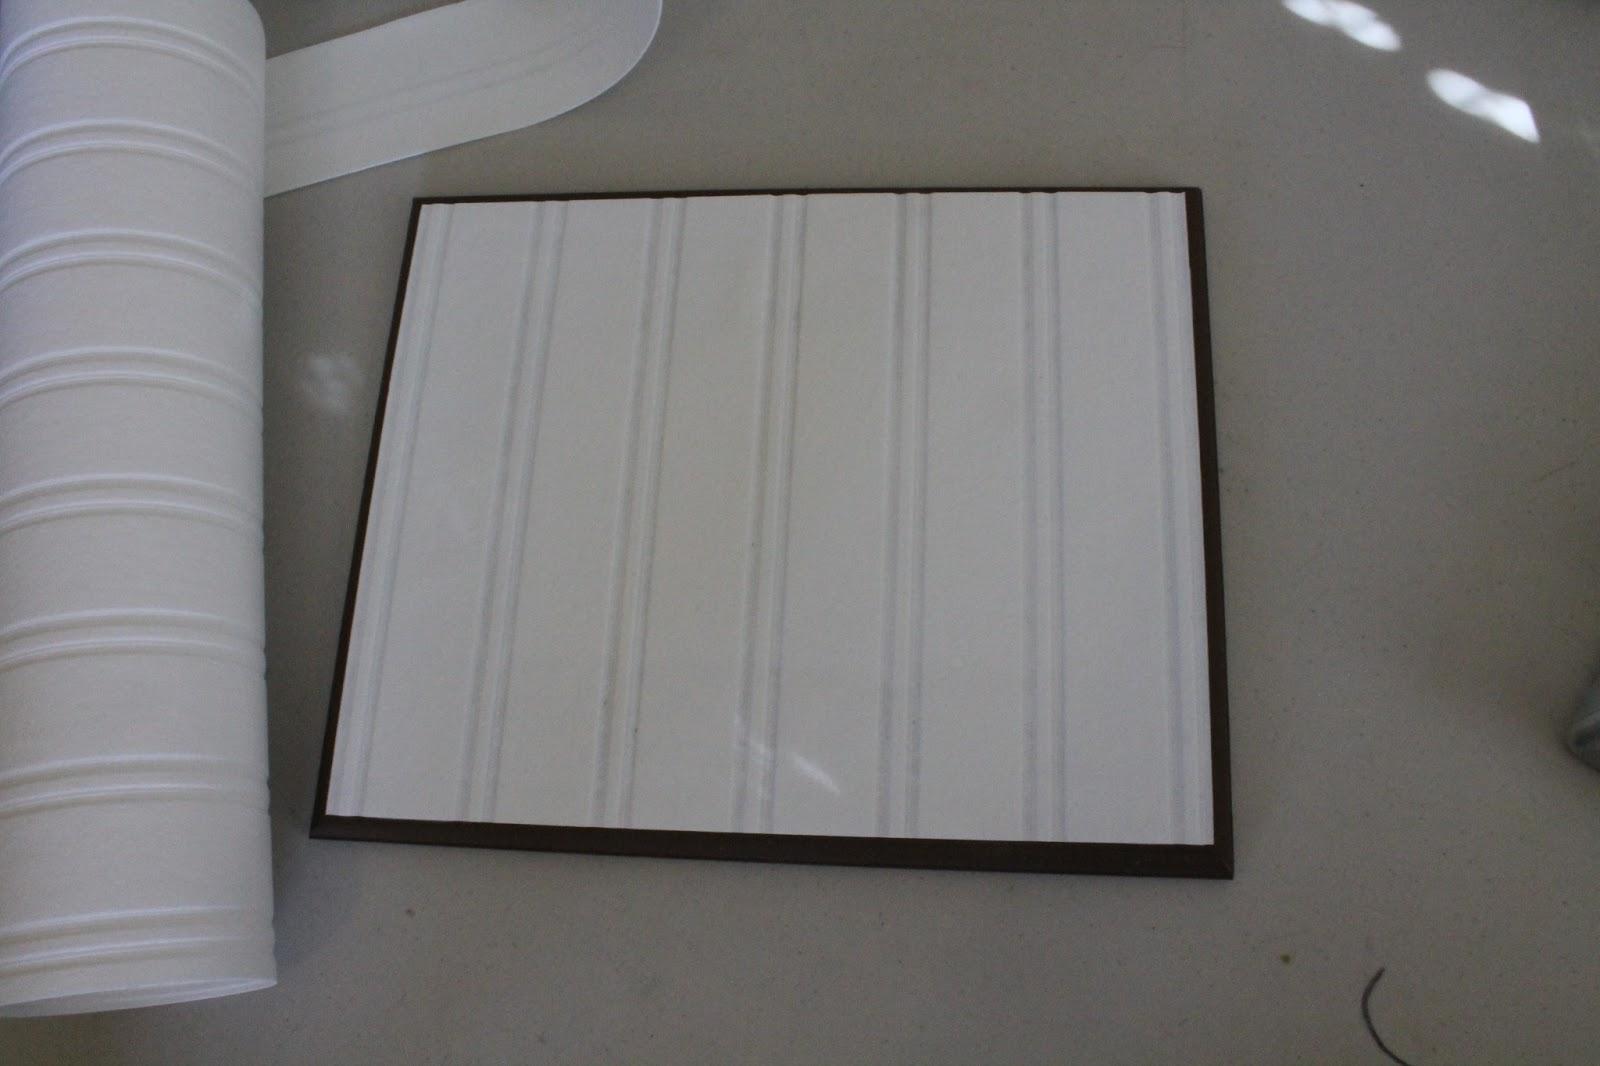 lowes wallpaper   wwwhigh definition wallpapercom 1600x1066